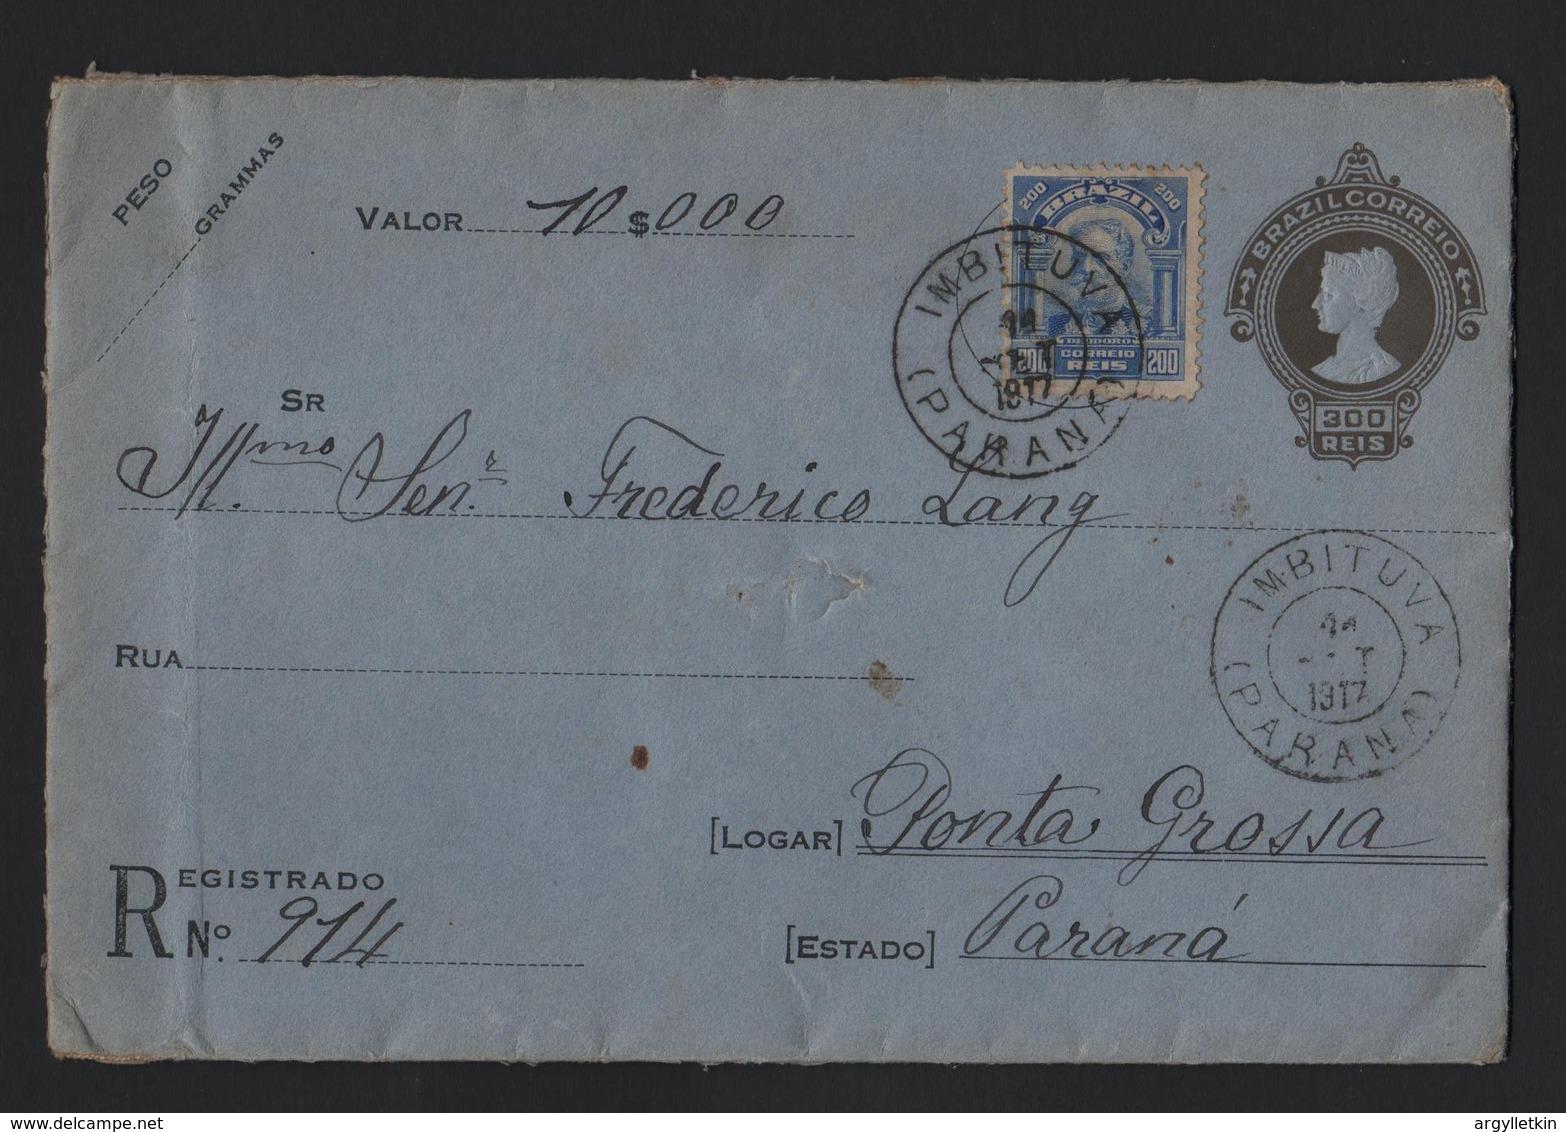 BRAZIL REGISTERED STATIONERY ENVELOPE IMBITUVA PARANA 1917 - Brazil